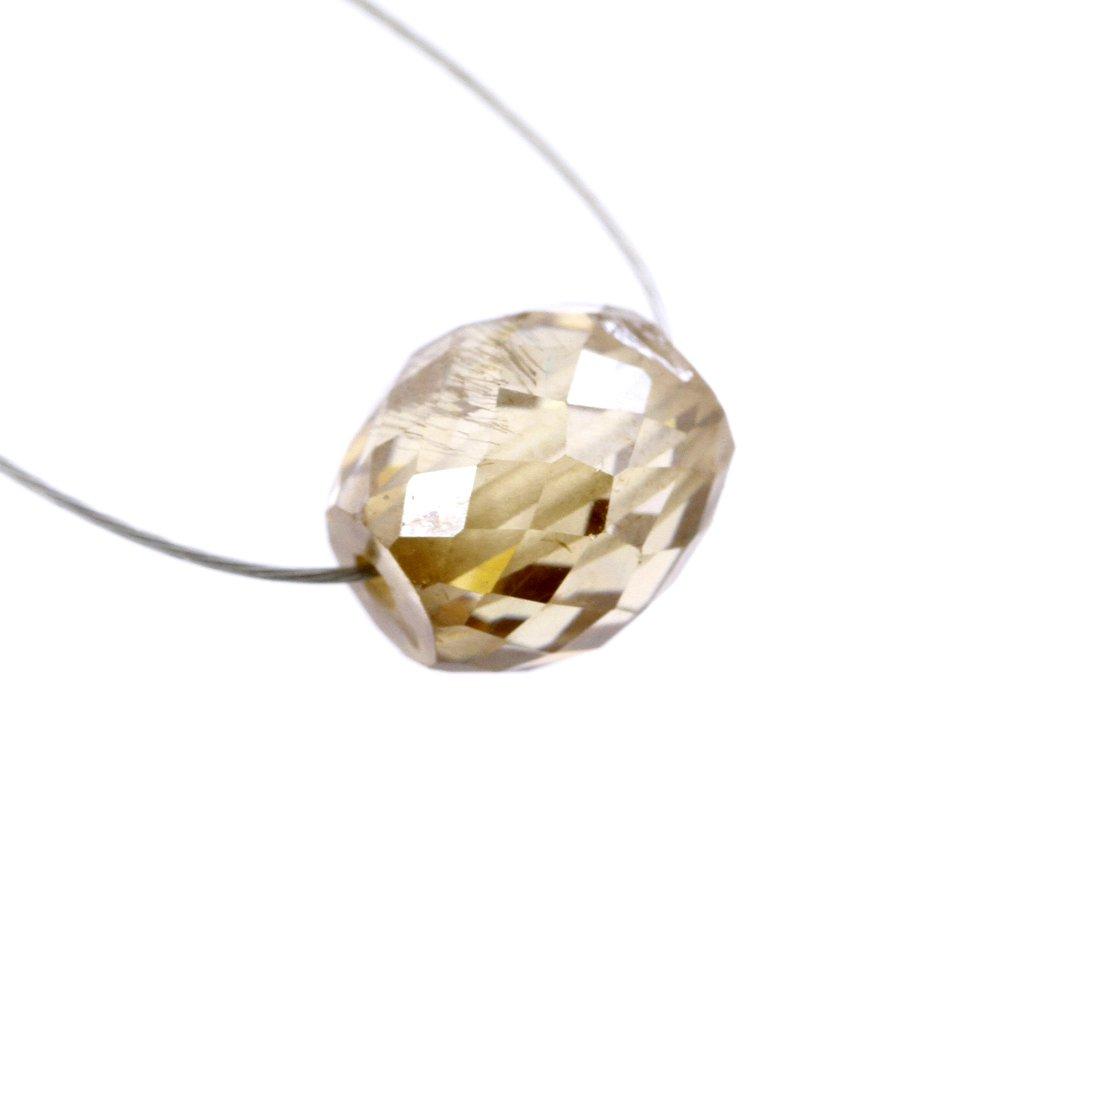 Skyjewels Certified 3.85 Carat 7 mm Loose Champagne Diamond Bead